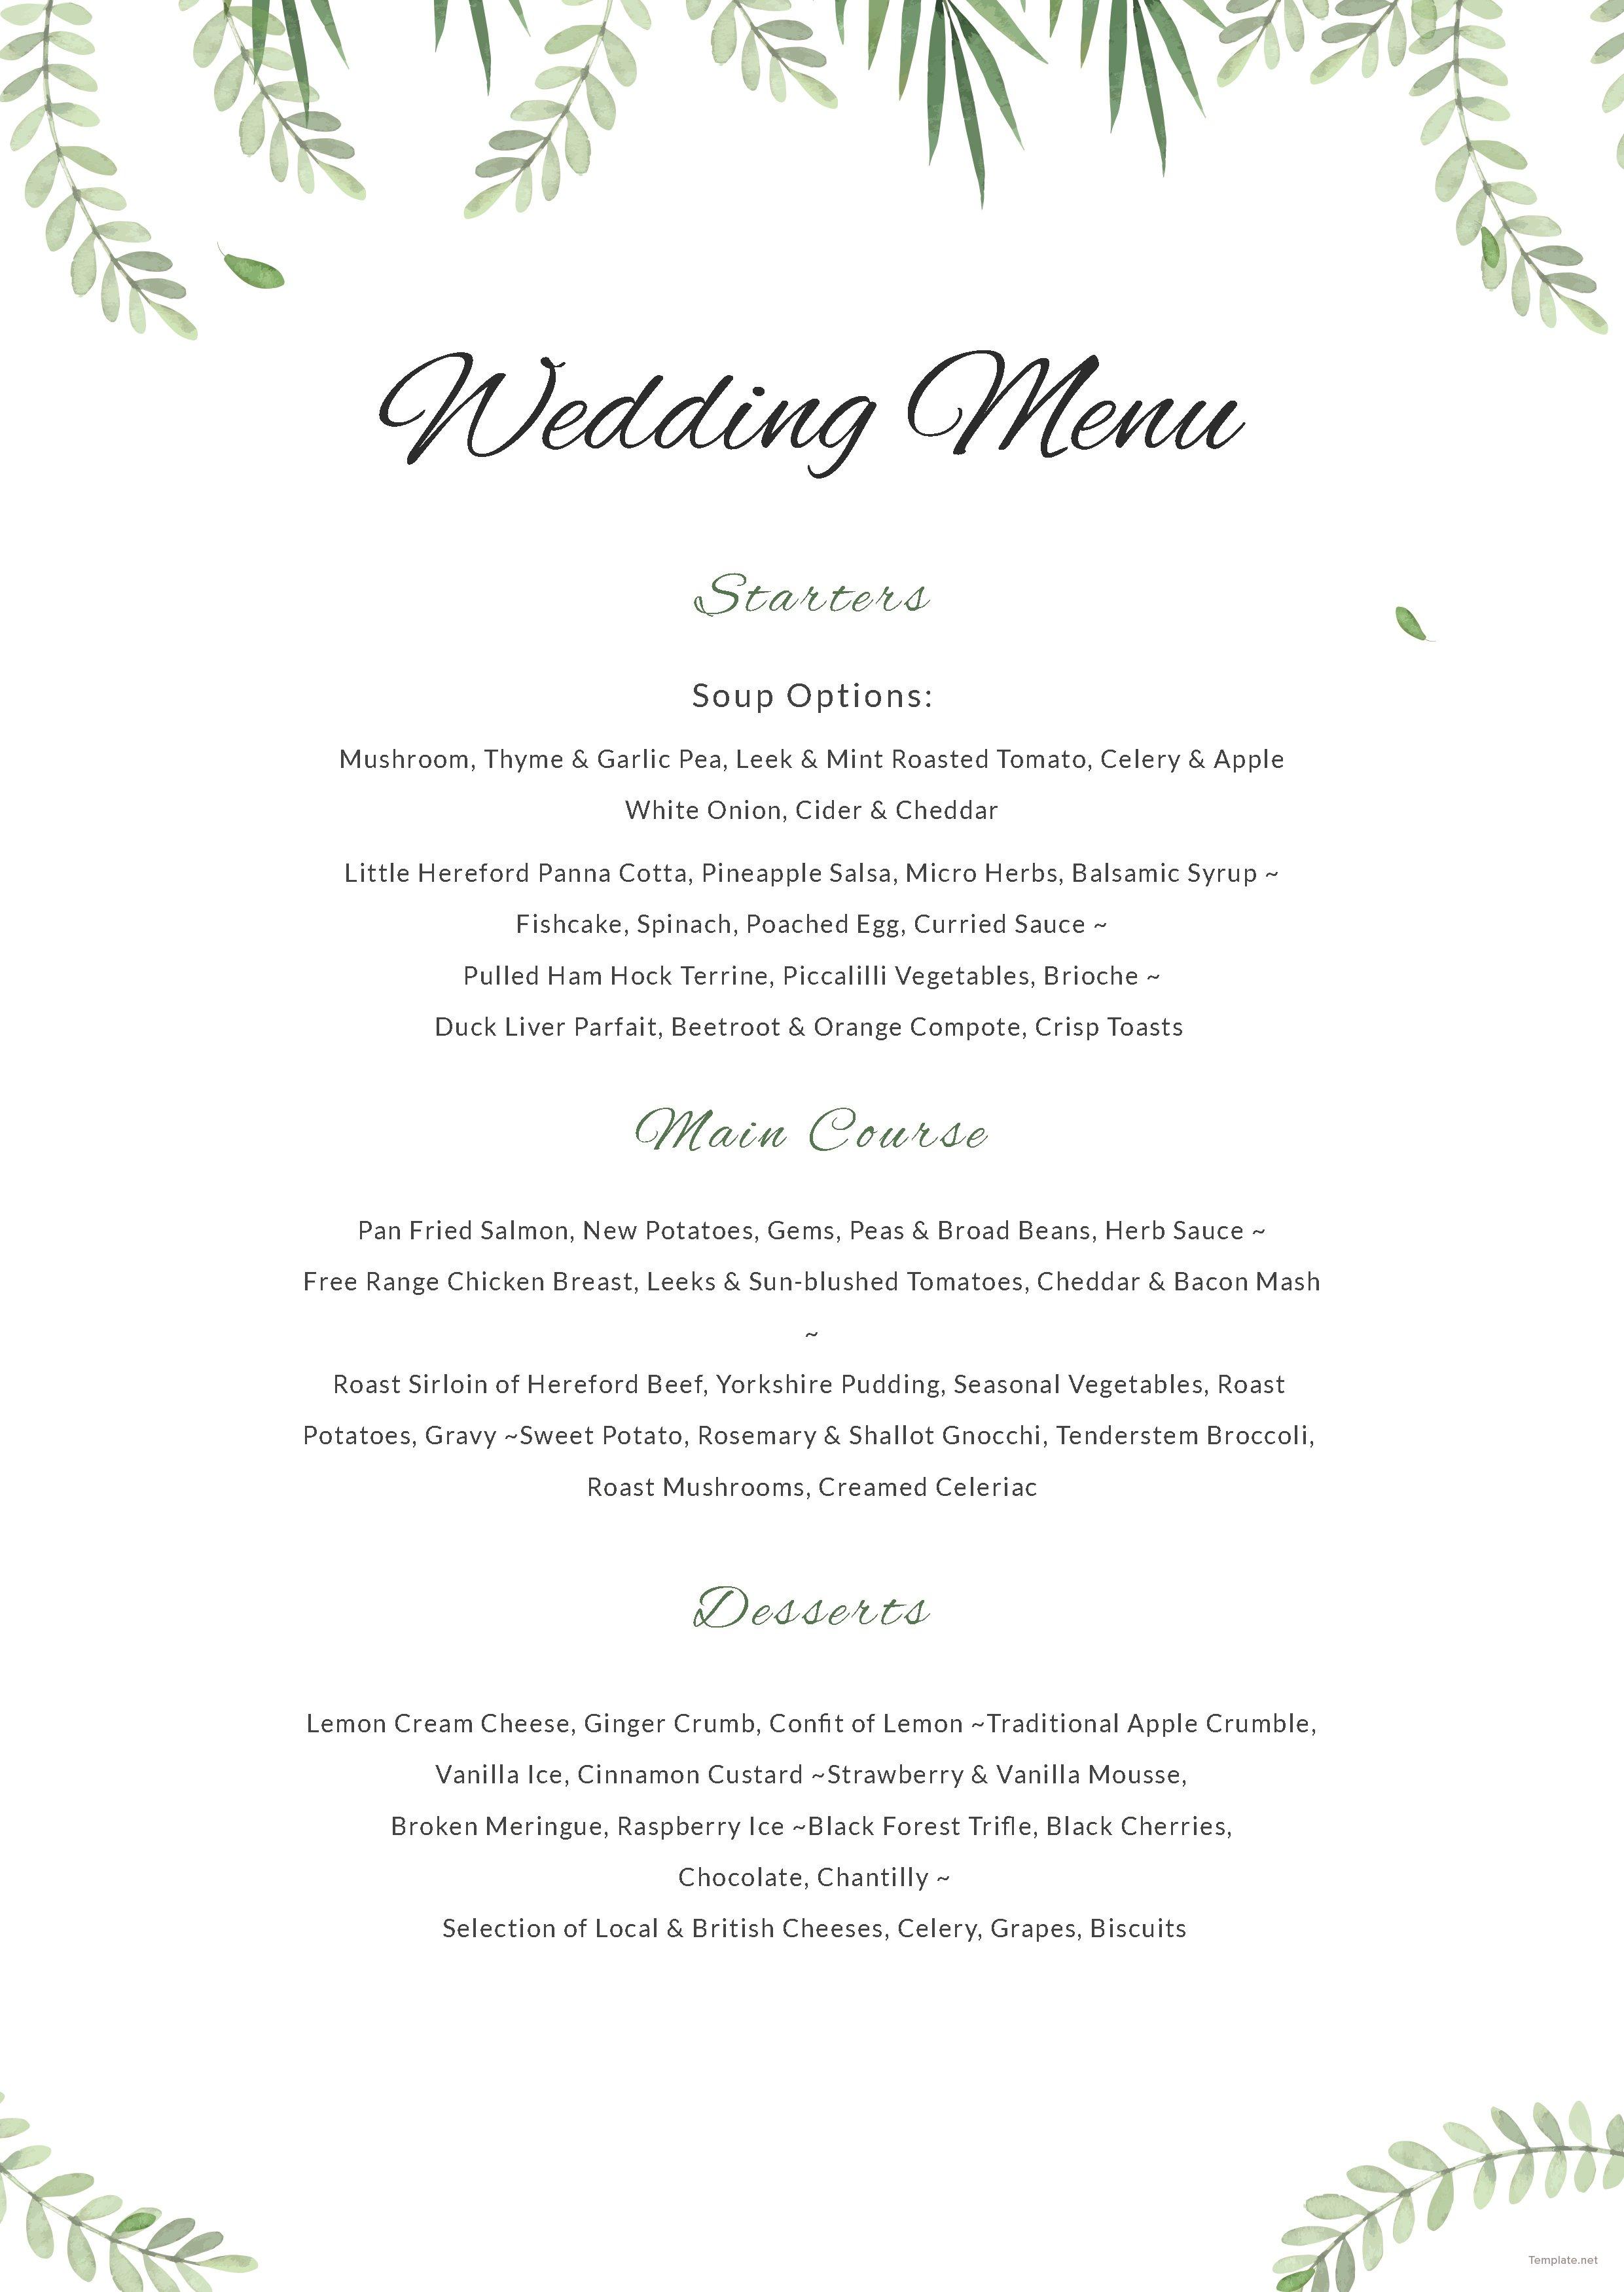 Sample Wedding Menu Template in Adobe Photoshop, Illustrator  Template.net